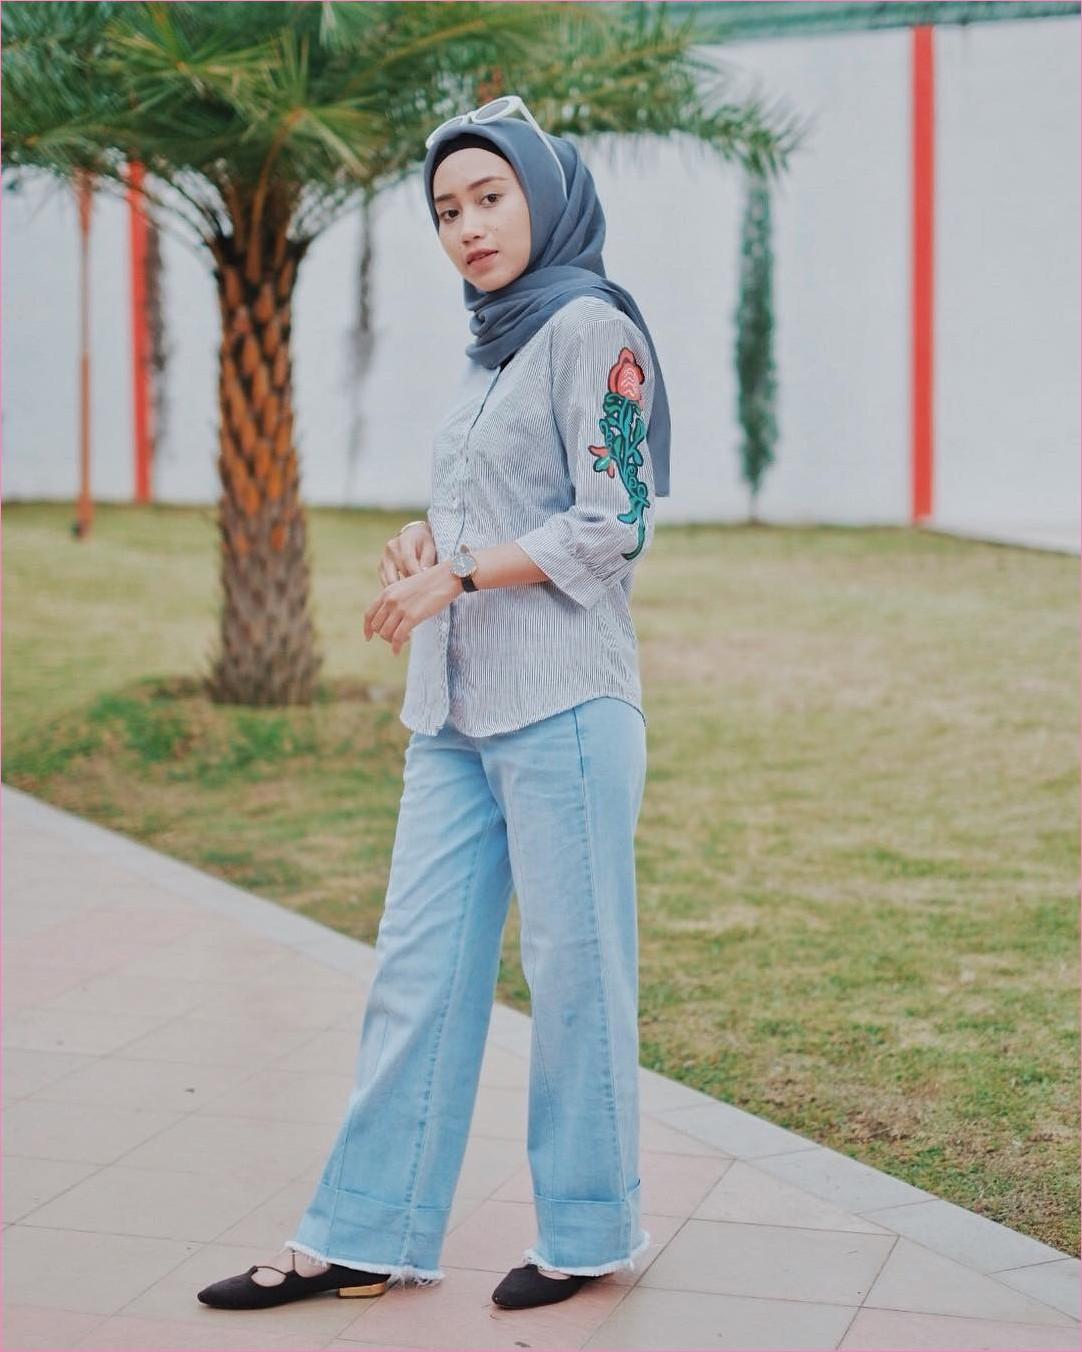 Outfit Celana Jeans Untuk Hijabers Ala Selebgram 2018 blouse kemeja stripe biru tua kerudung segiempat hijab square abu sedang pants jeans denim ciput lace ups loafers and slip ons jam tangan hitam kacamata ootd trendy